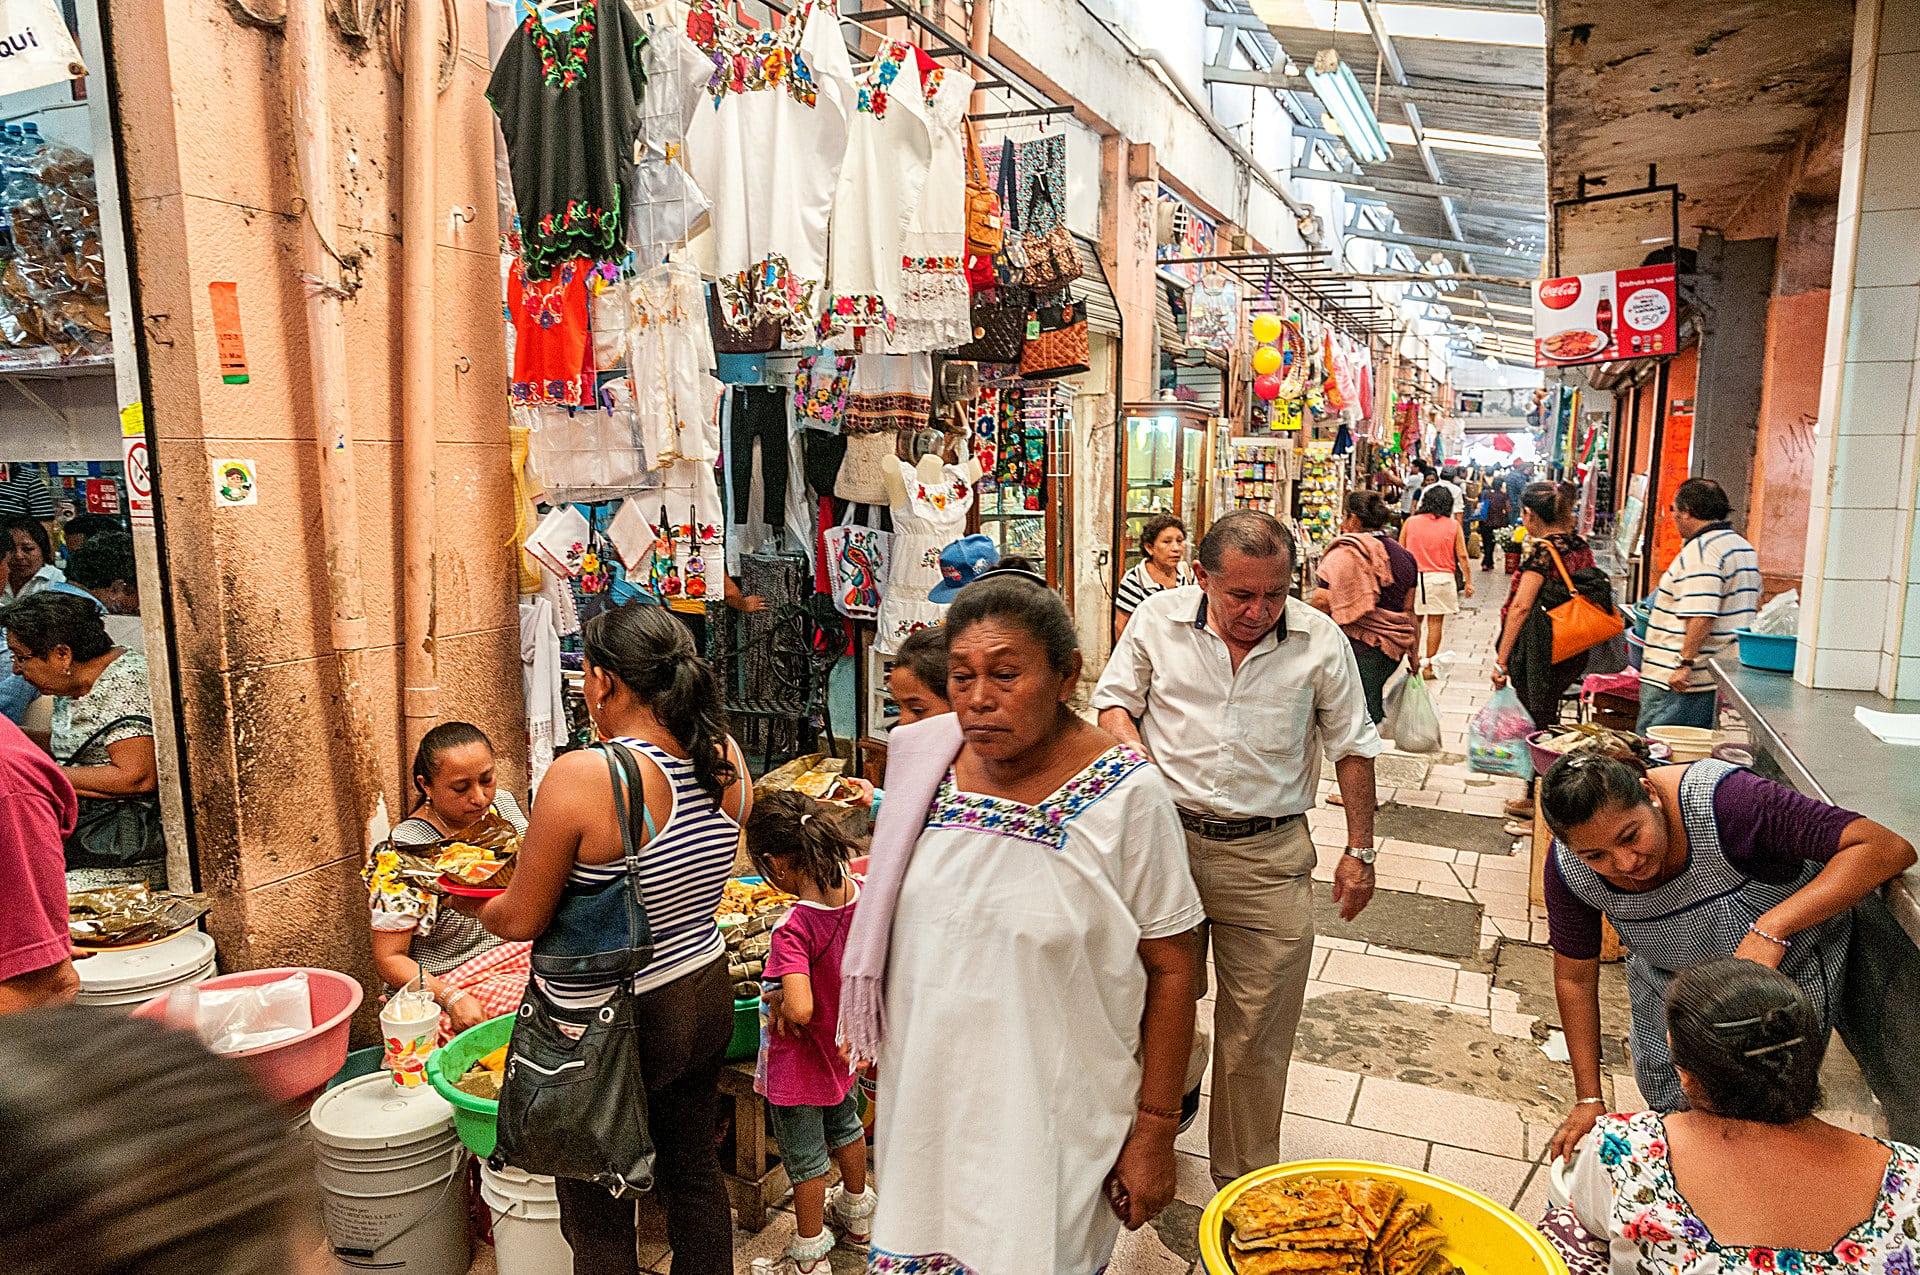 Mercado von Mérida